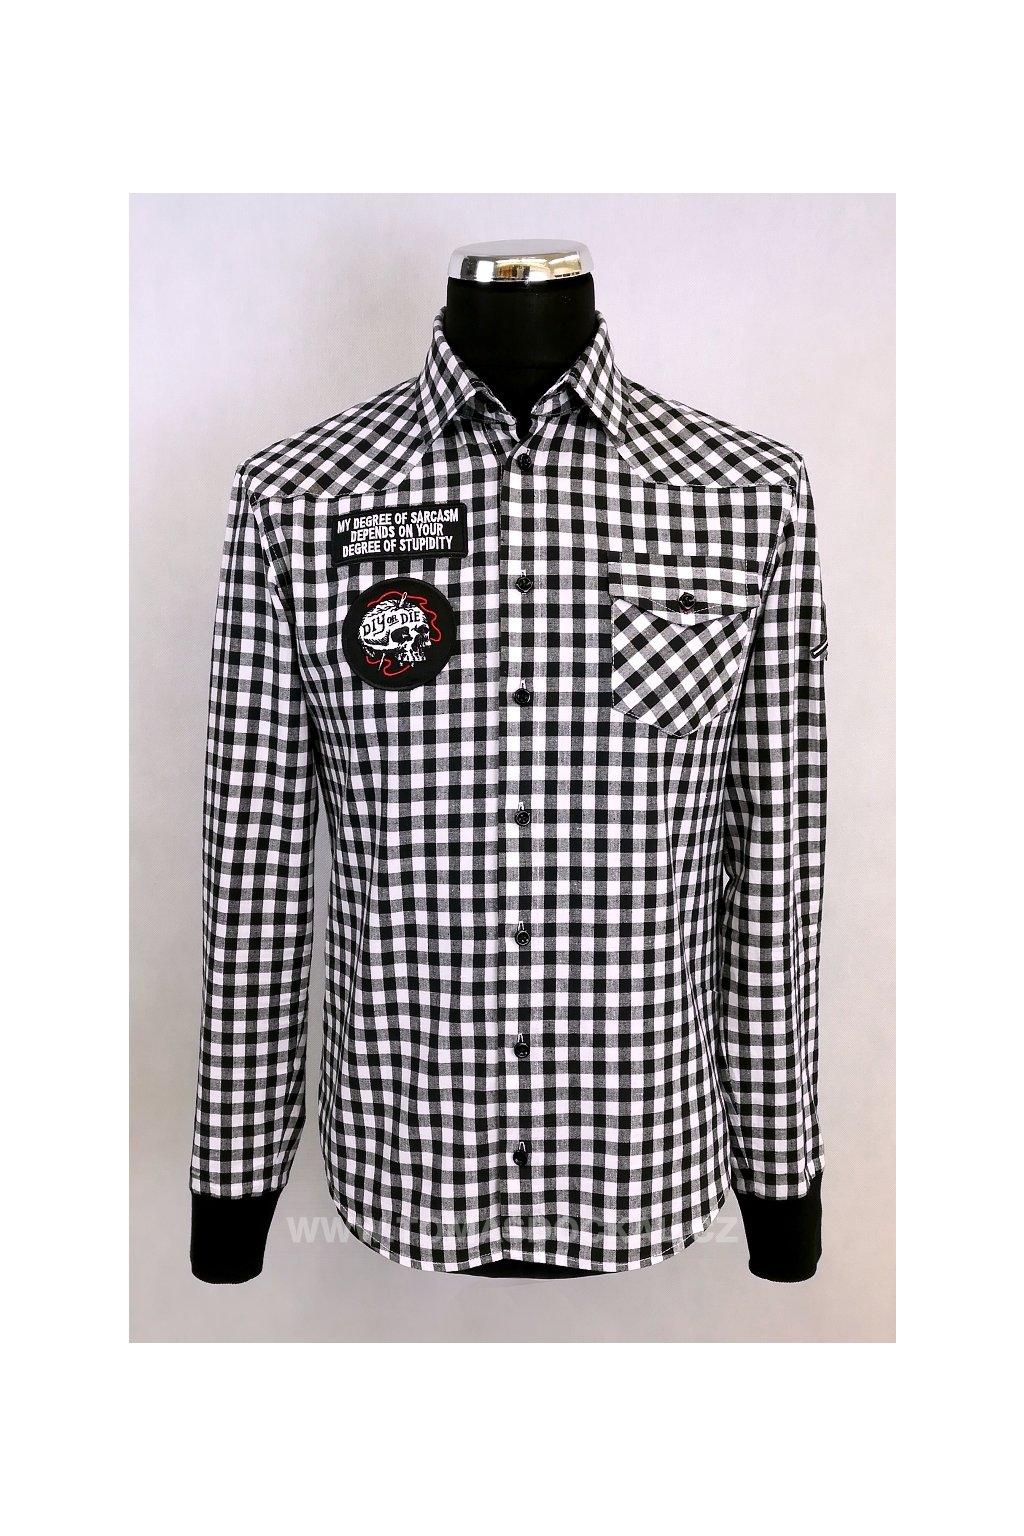 Košile černobílá kostka s nášivkami / velikost S